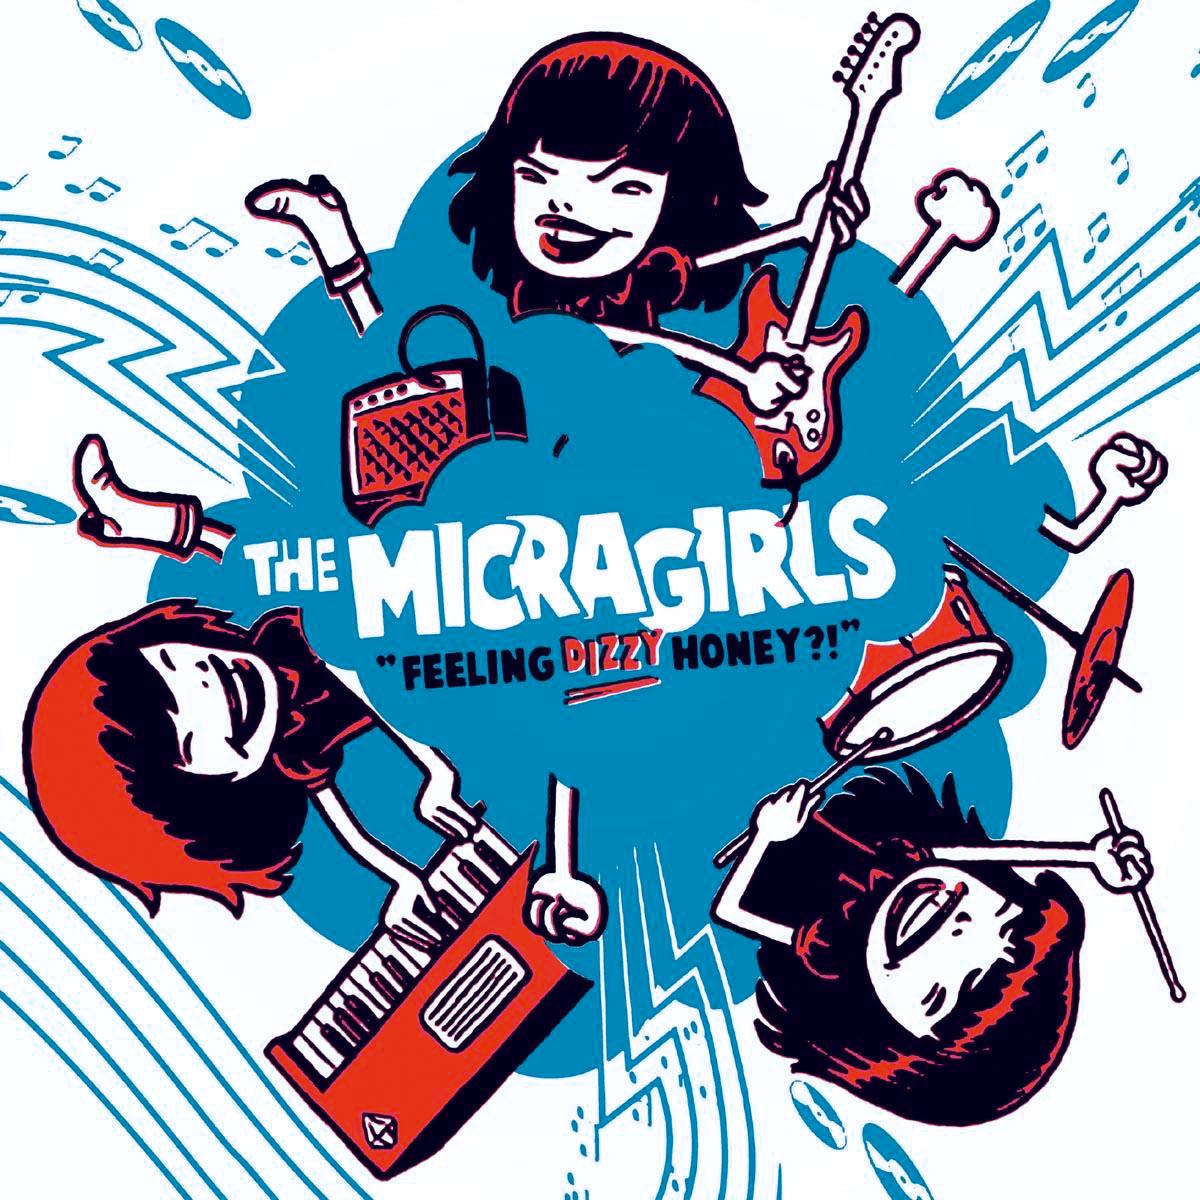 The Micragirls - Feeling Dizzy Honey?!